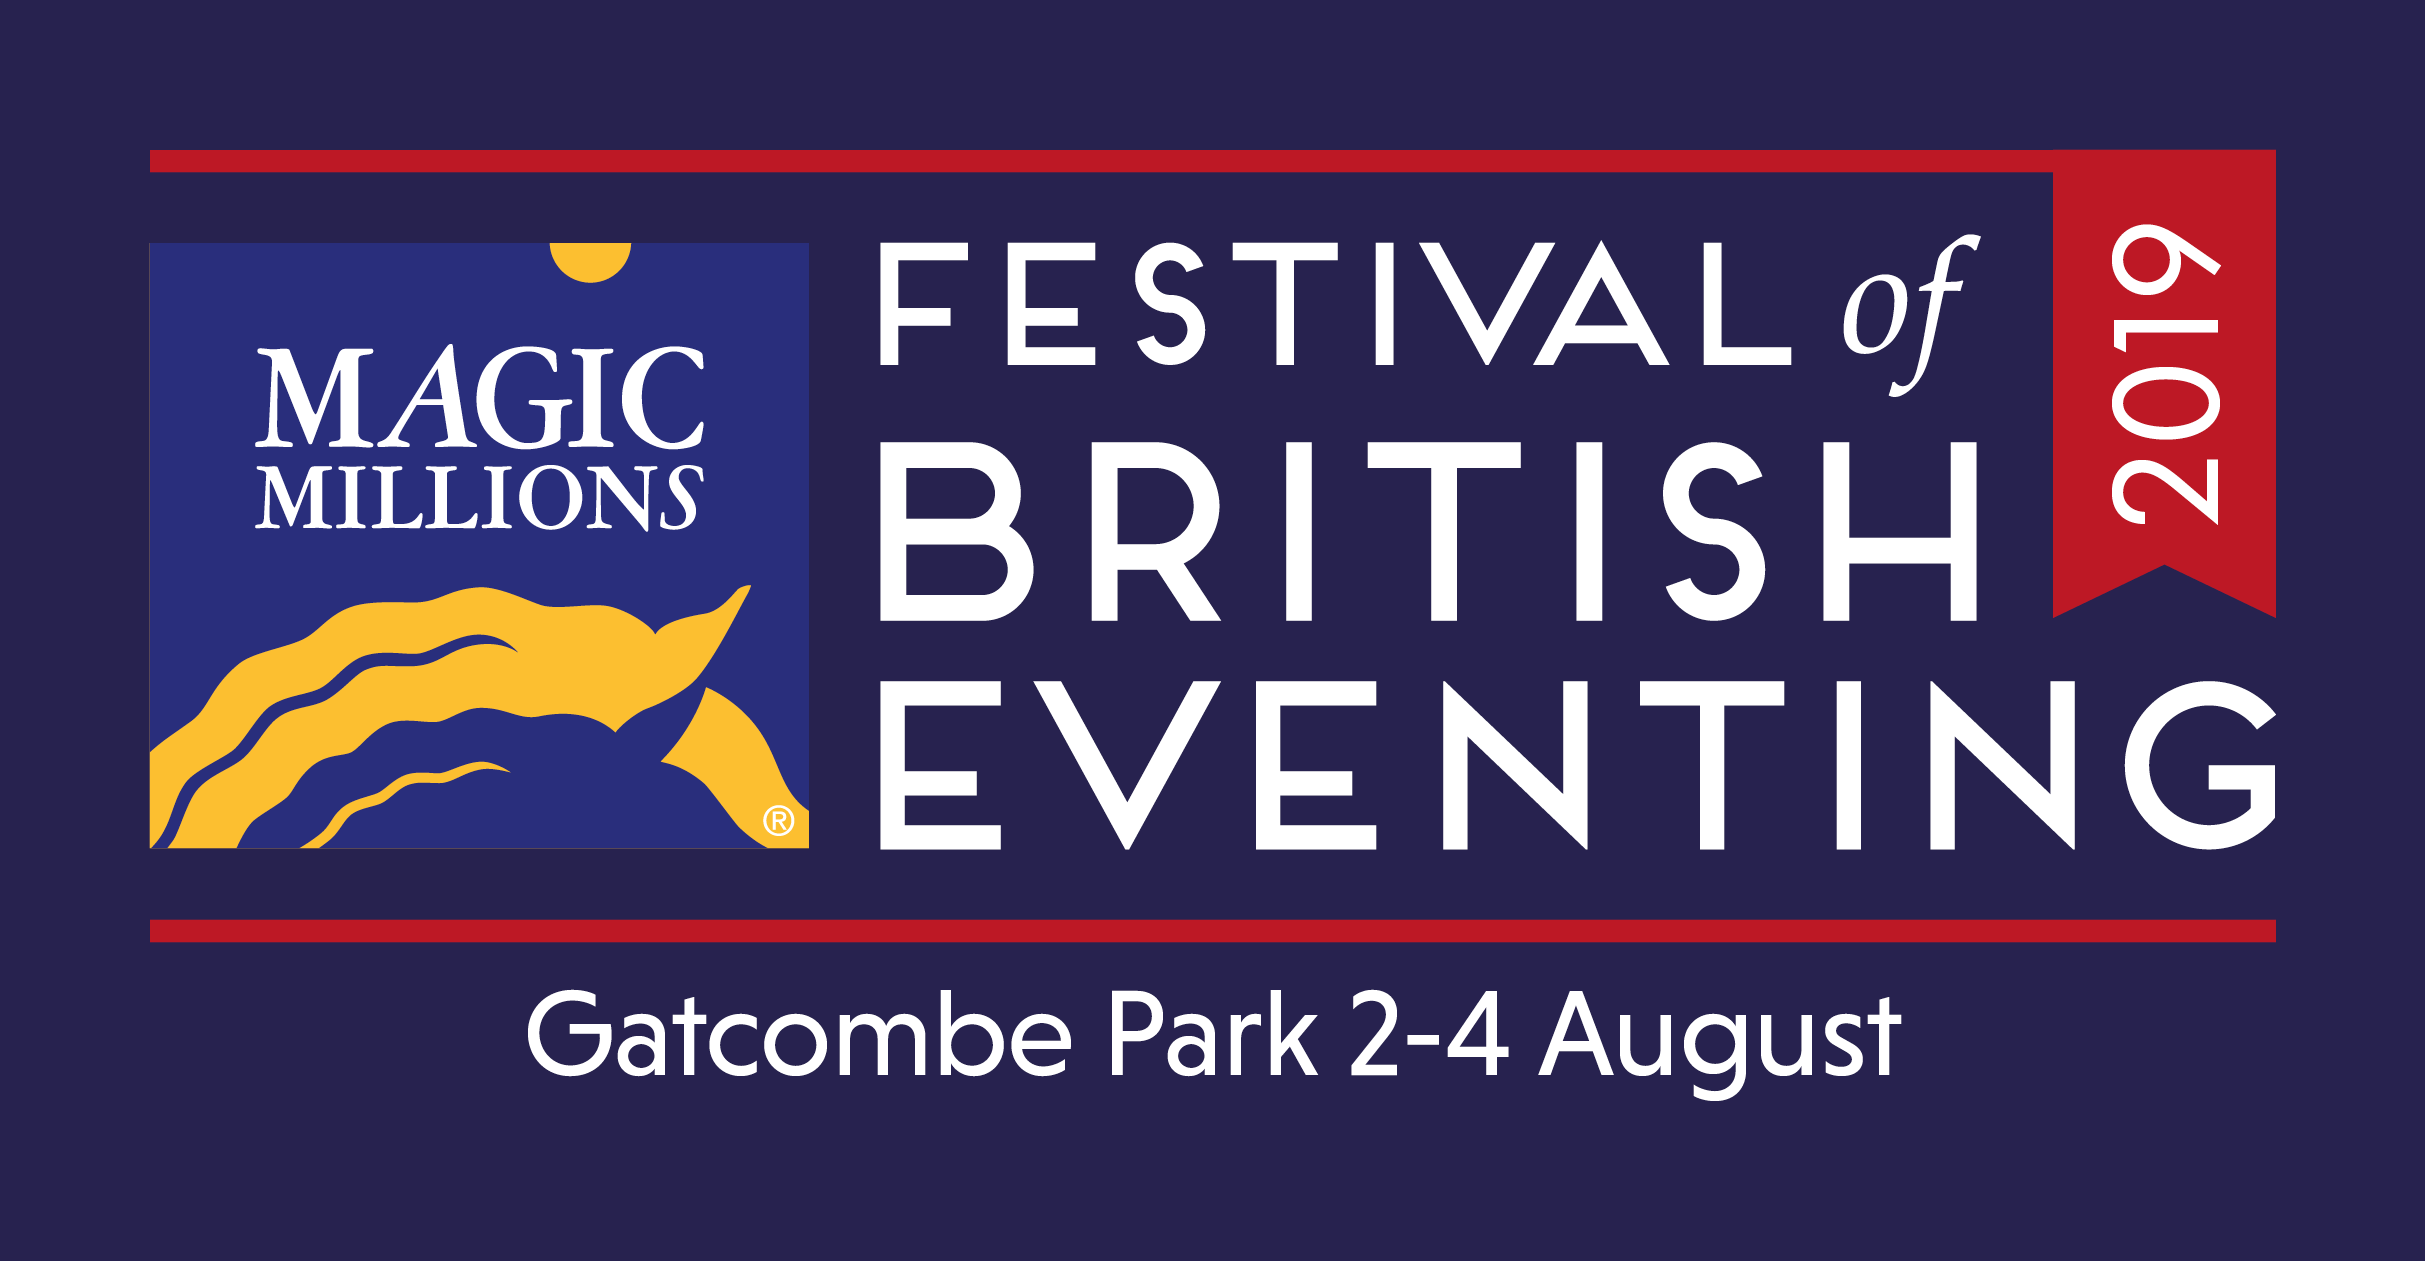 Gatcombe event poster